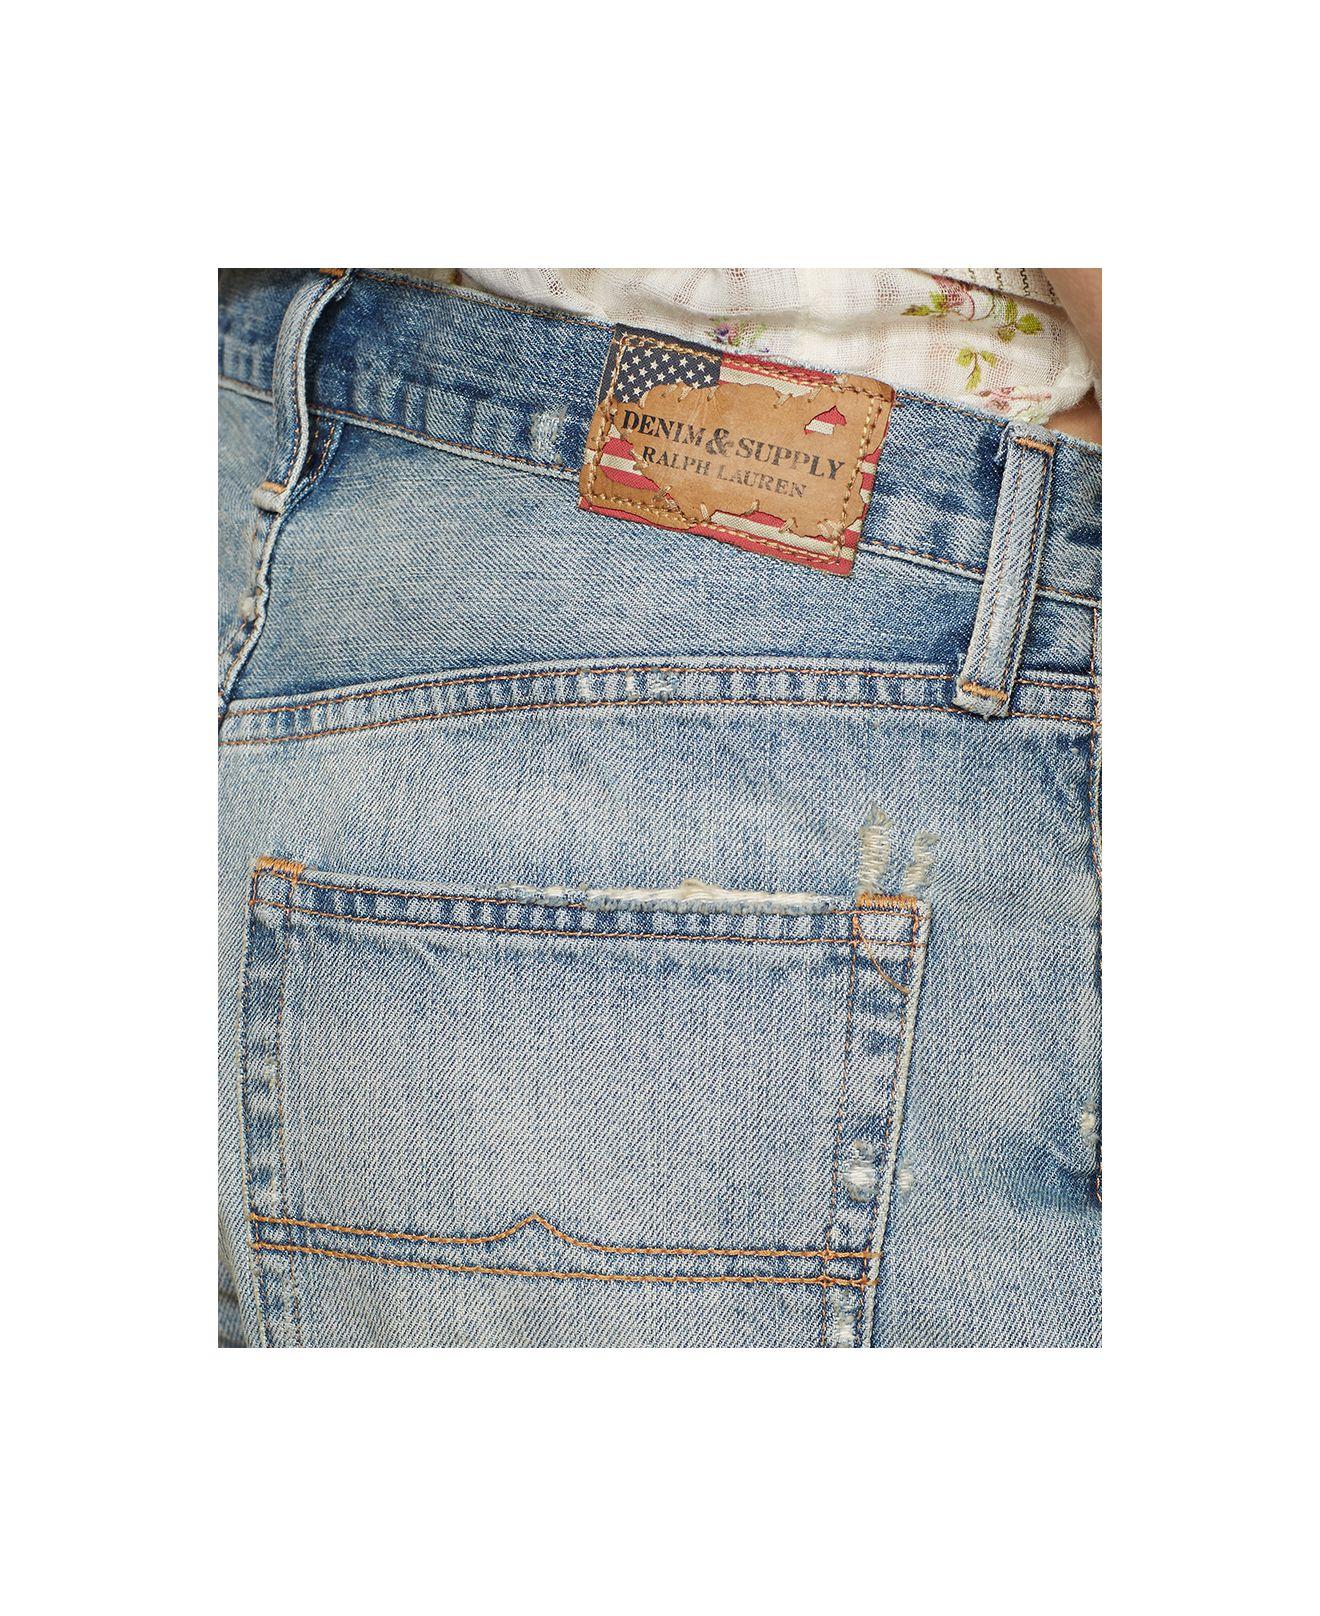 d4a7fe9d7 Denim & Supply Ralph Lauren Distressed Denim Boyfriend Shorts in ...